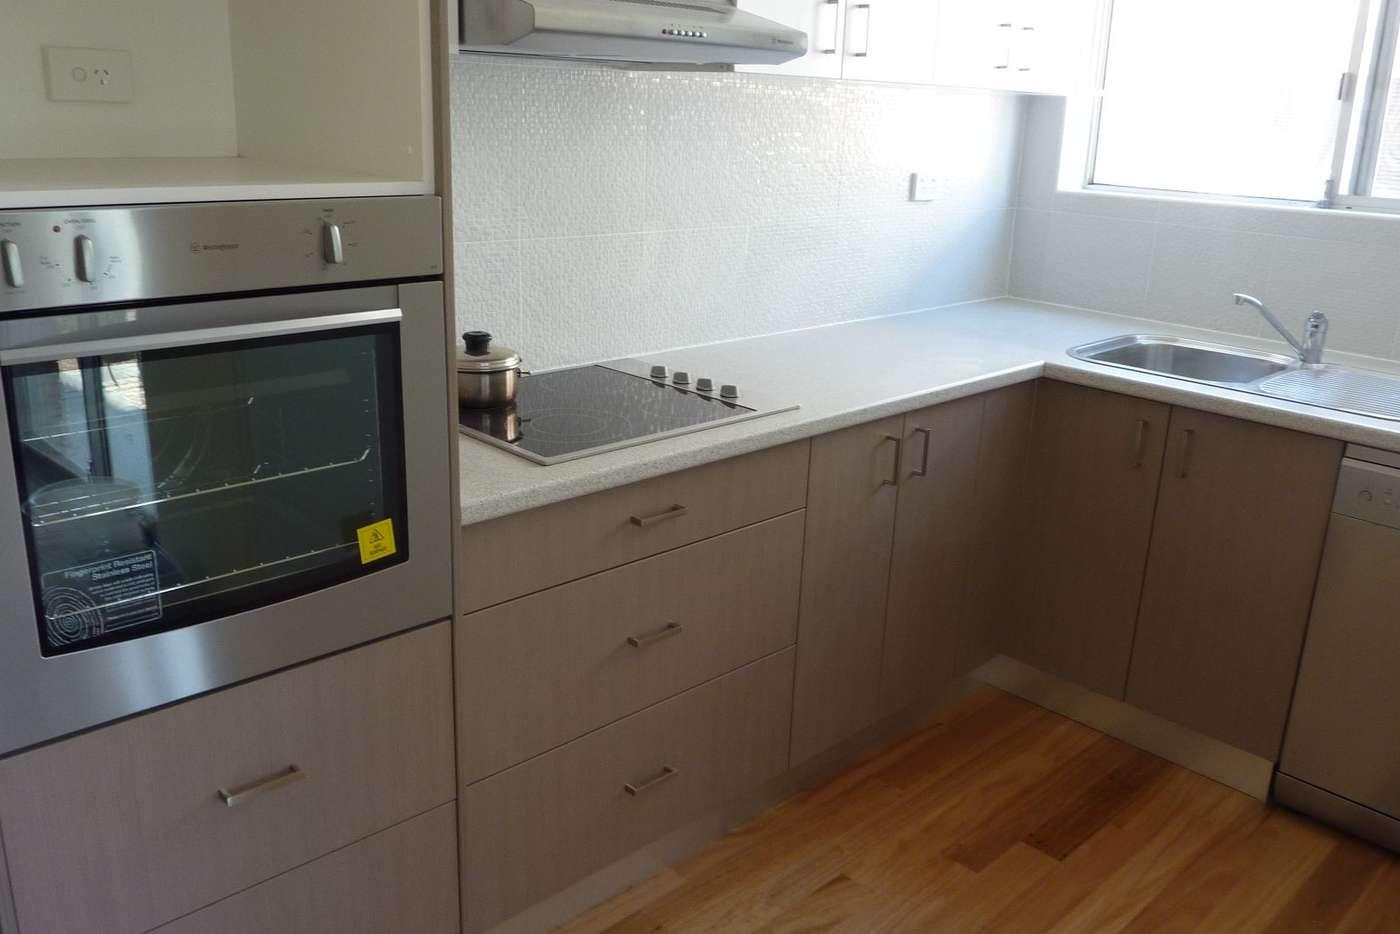 Main view of Homely apartment listing, 17/17 Carlton Street, Kensington NSW 2033